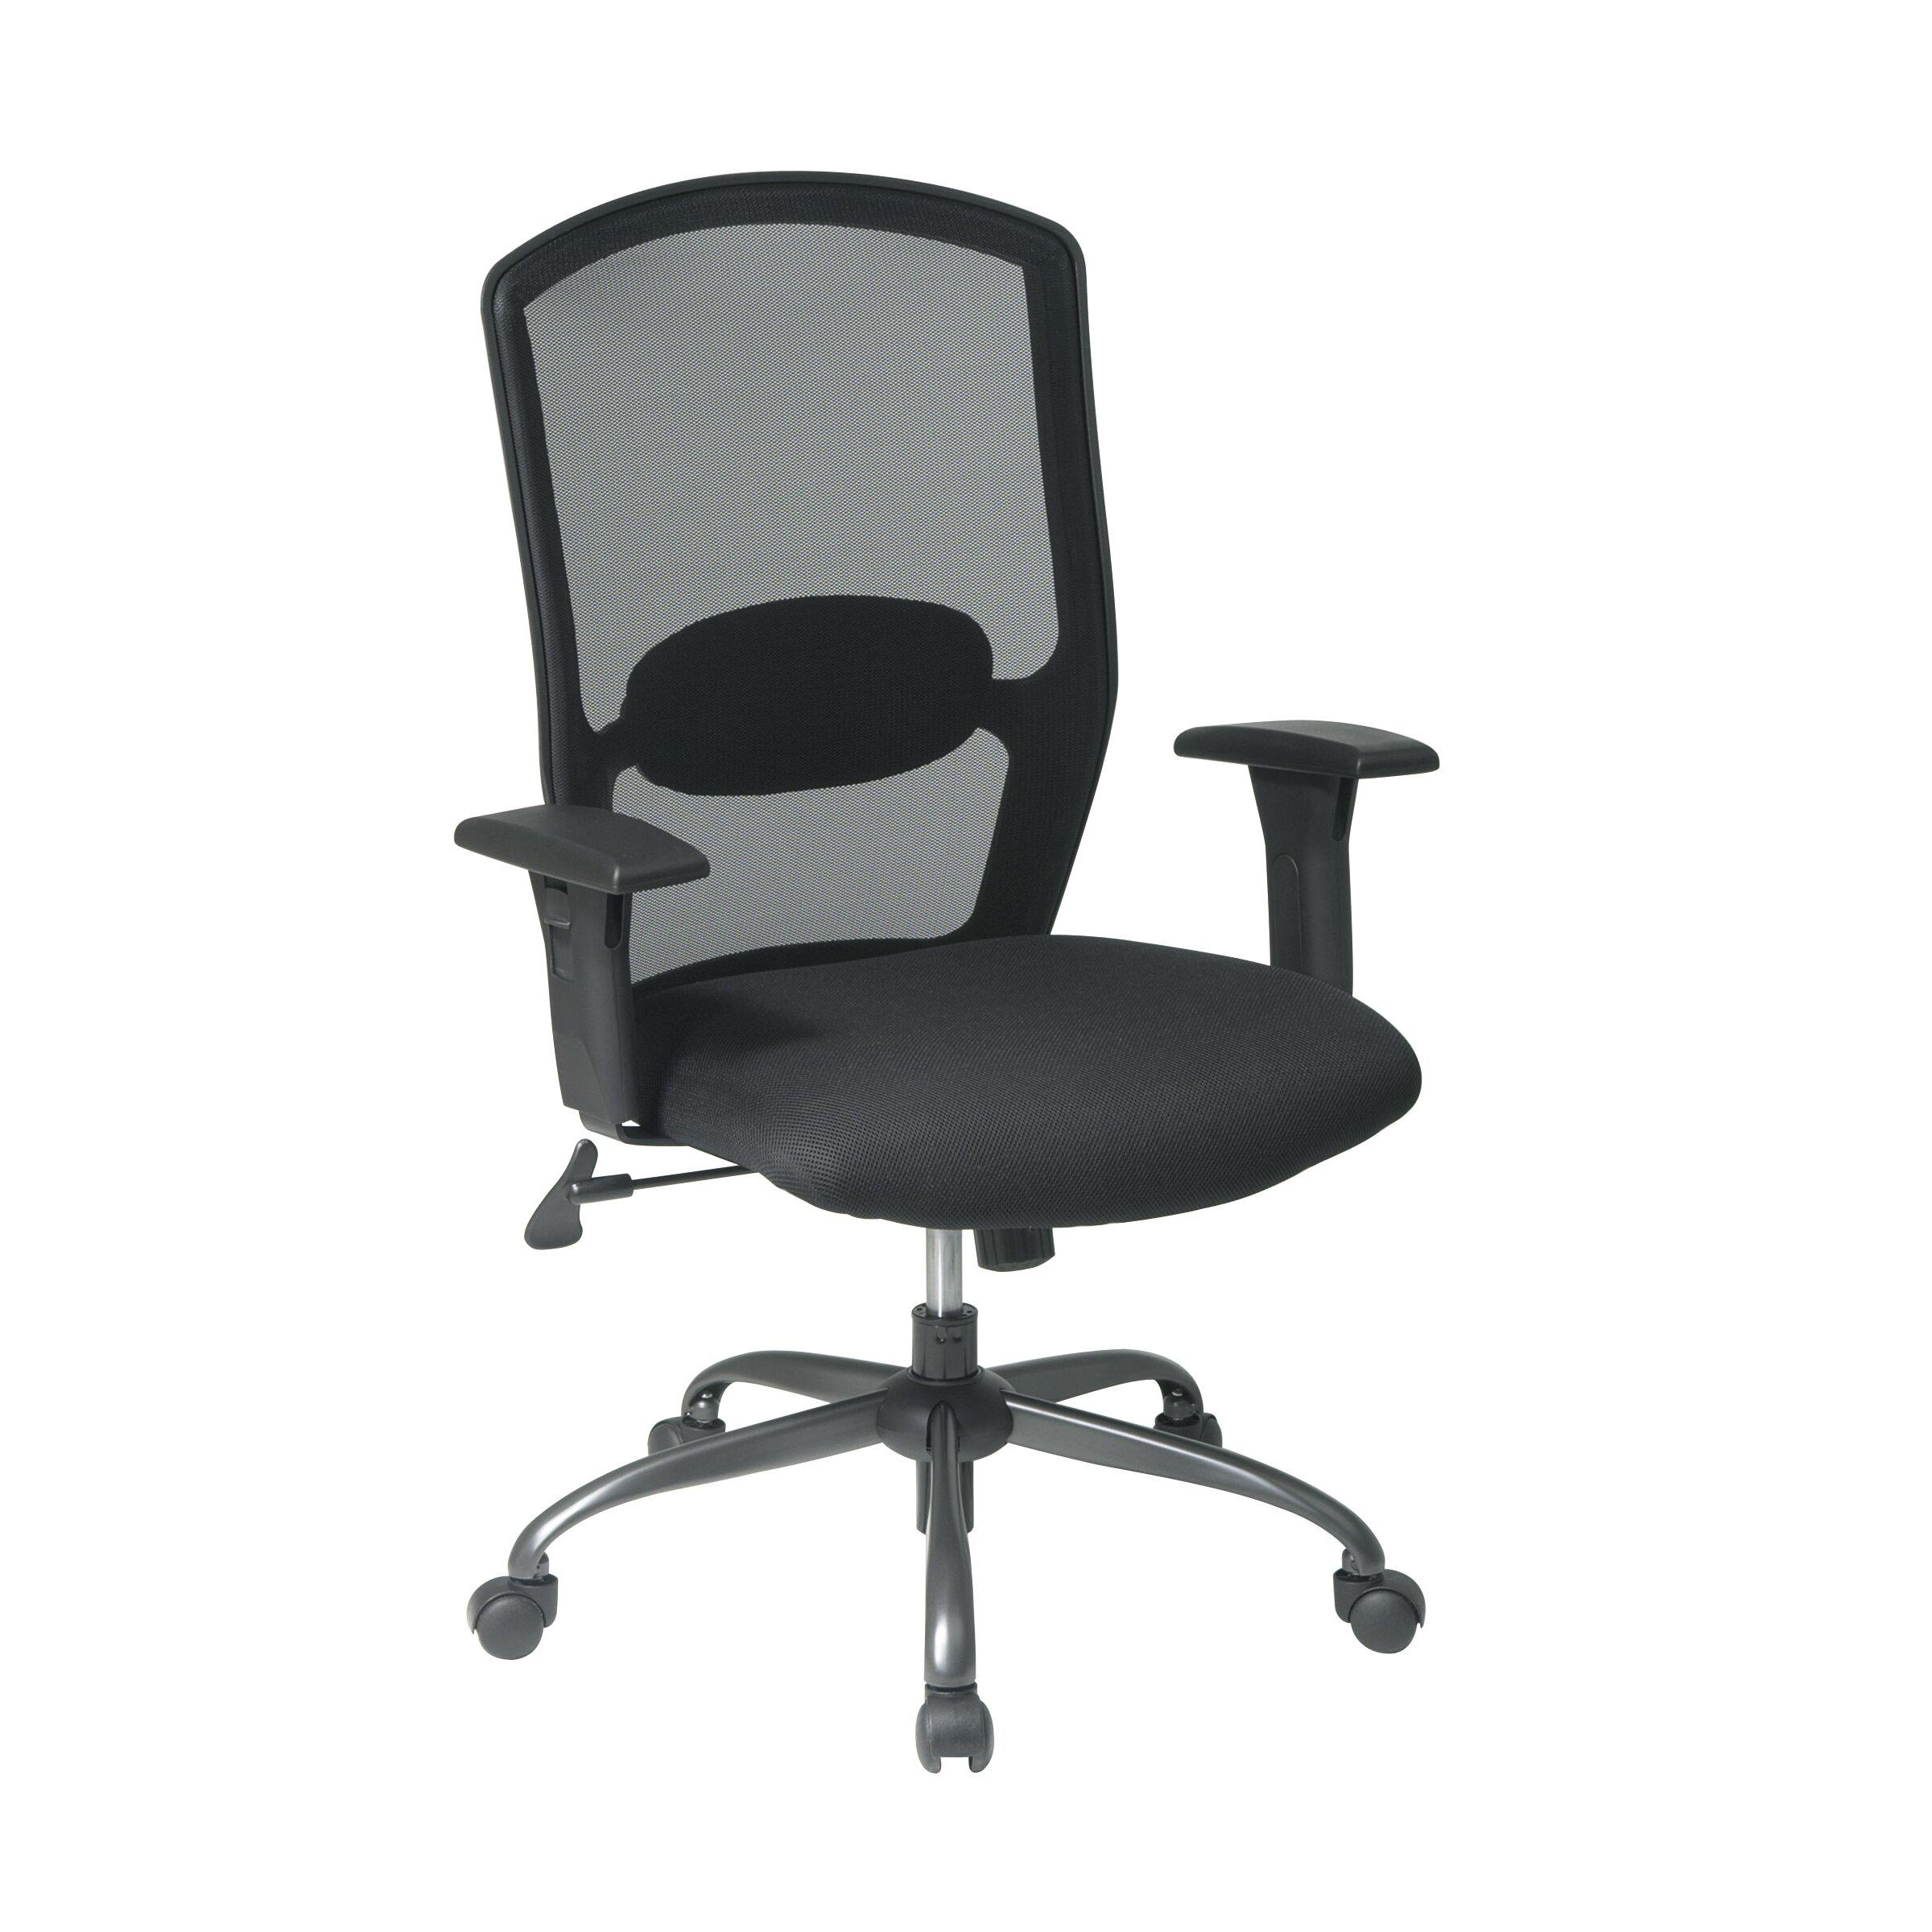 Office Star Screen Back Mesh Seat Office Chair Reviews Wayfair